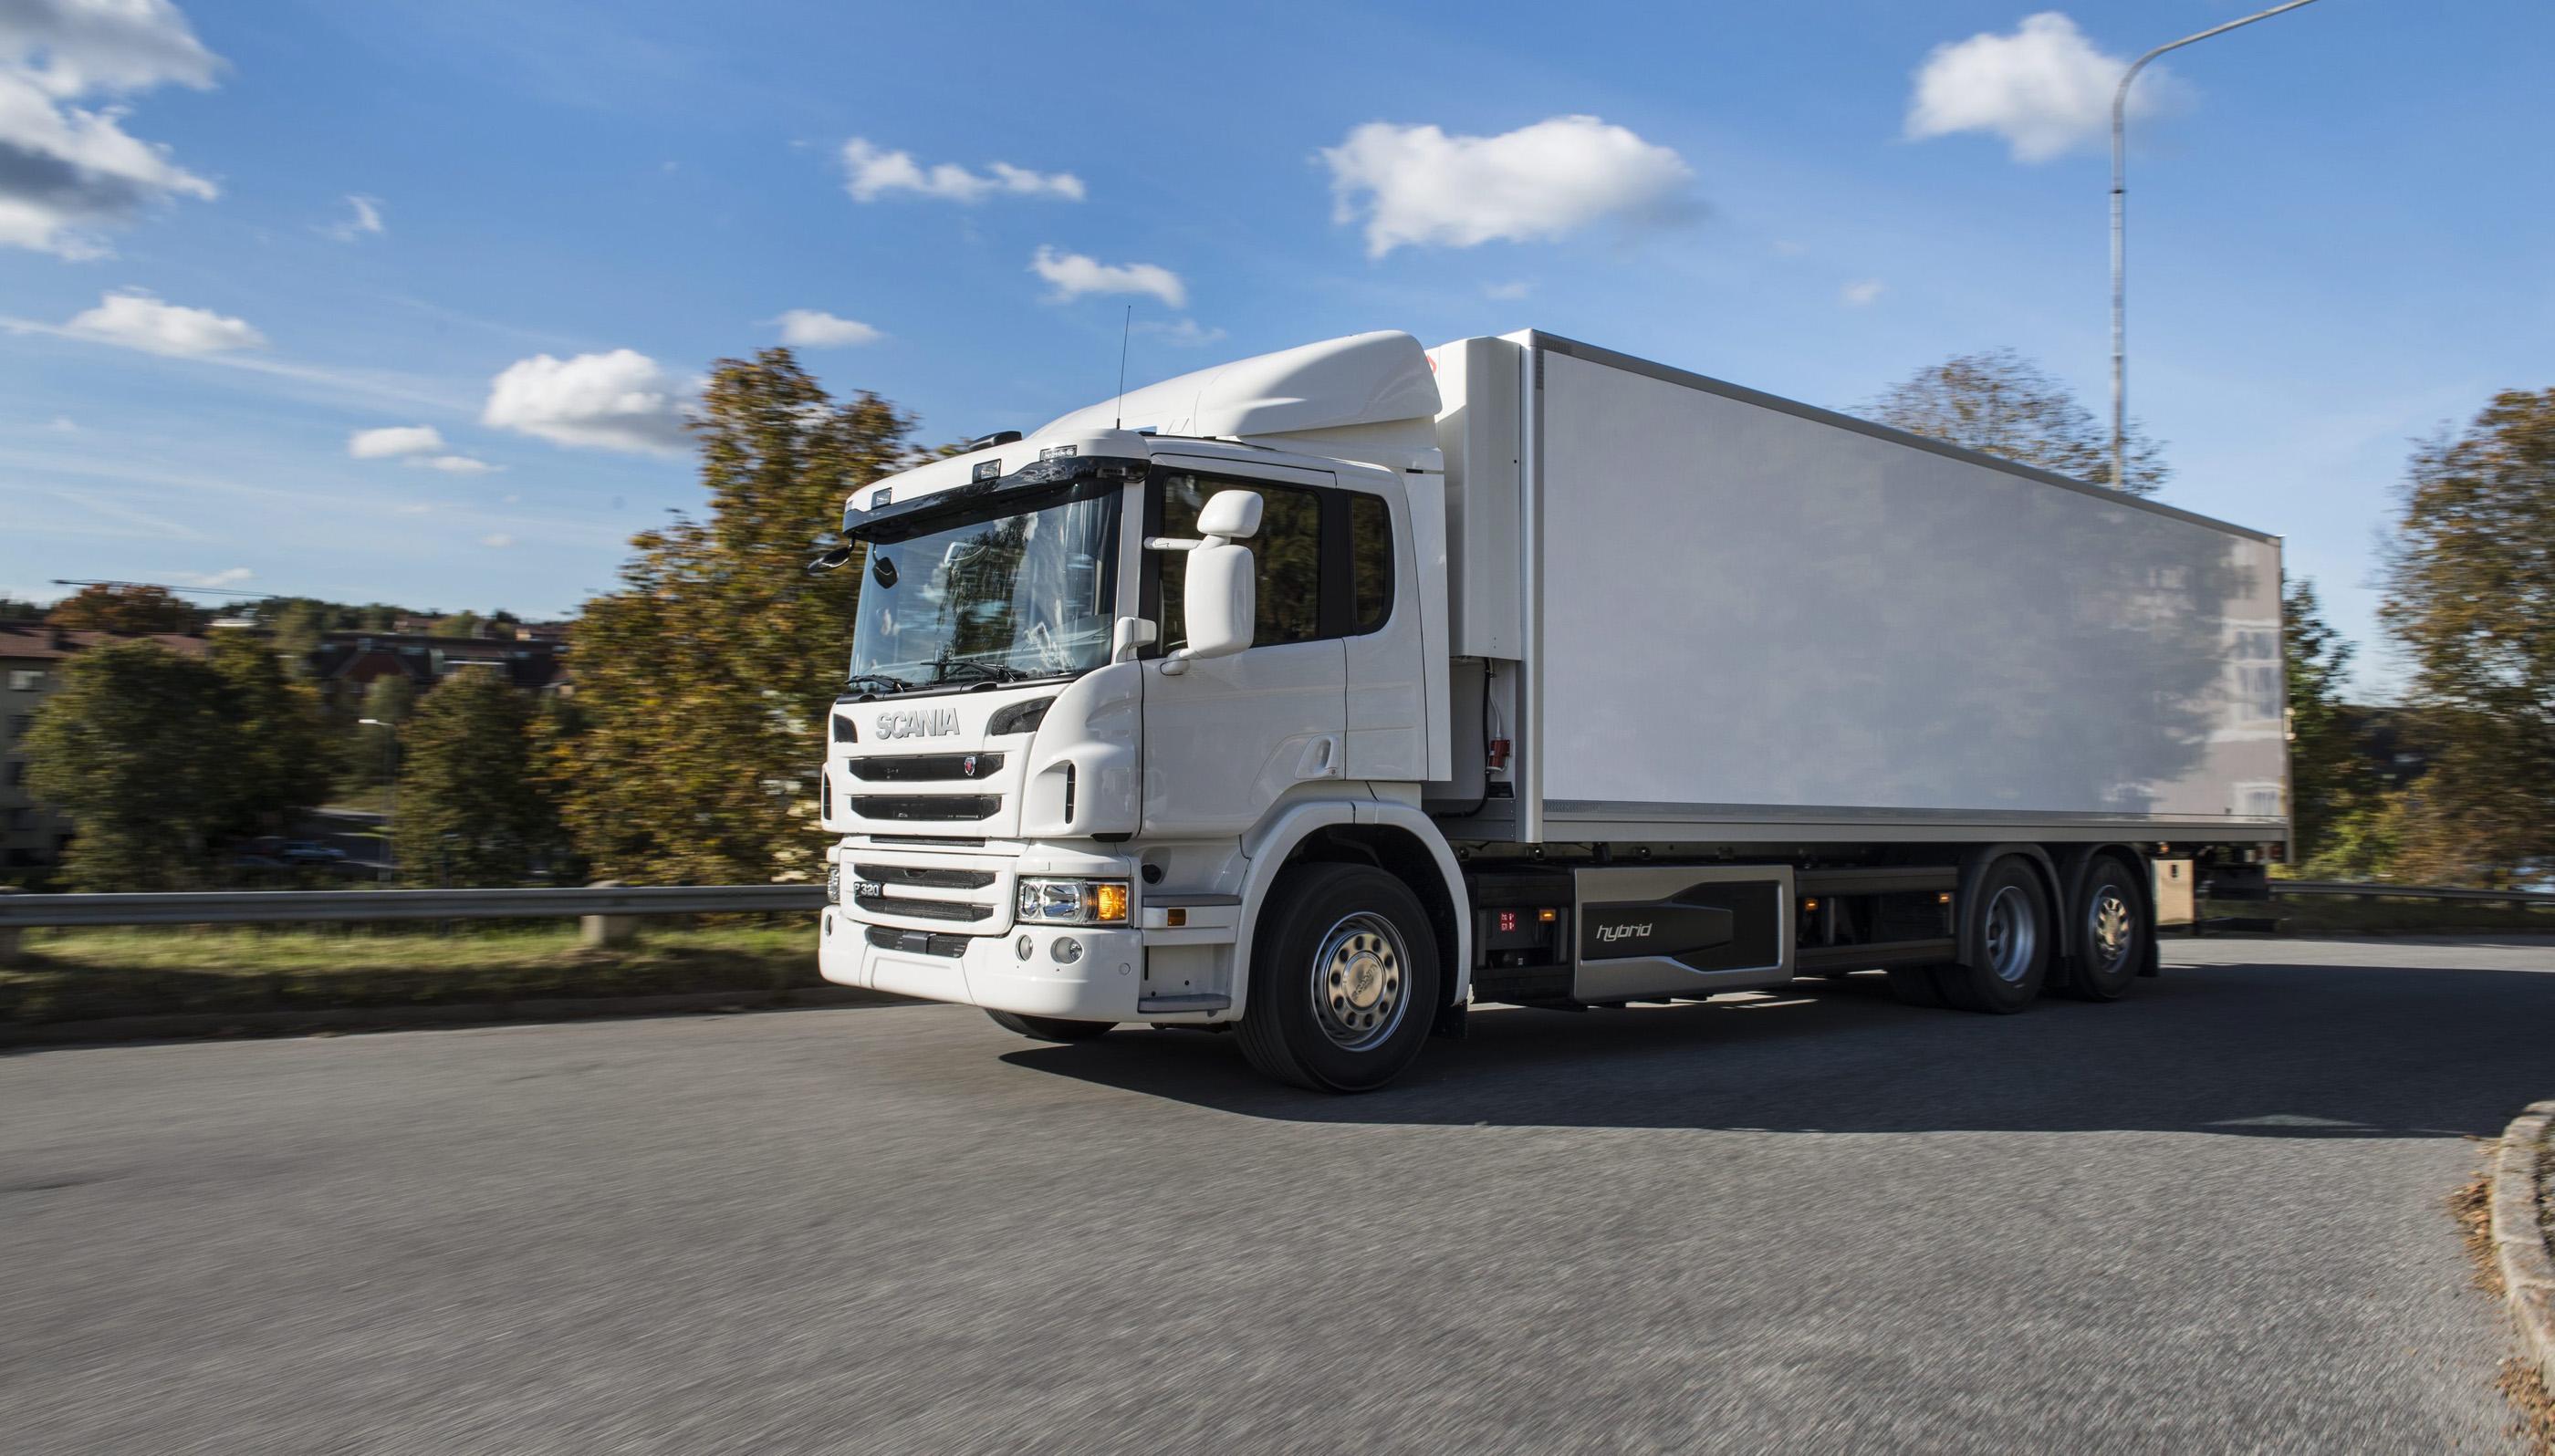 Scania Polska: Scania's hybrid truck wins prize for